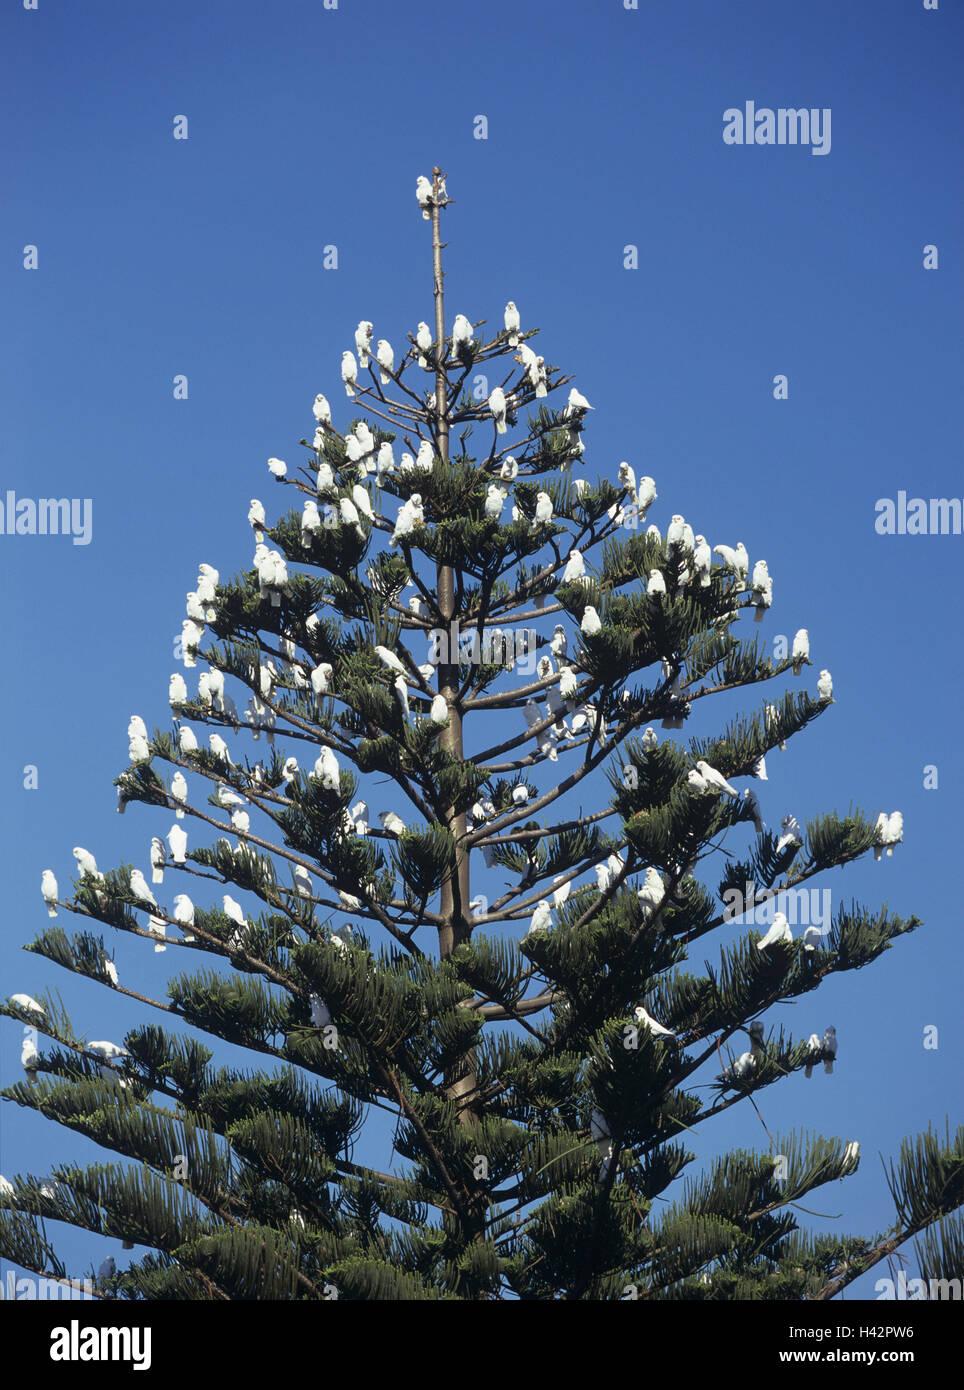 Australia, conifer, bare-eyed cockatoo, Cacatua sanguinea, from below, - Stock Image